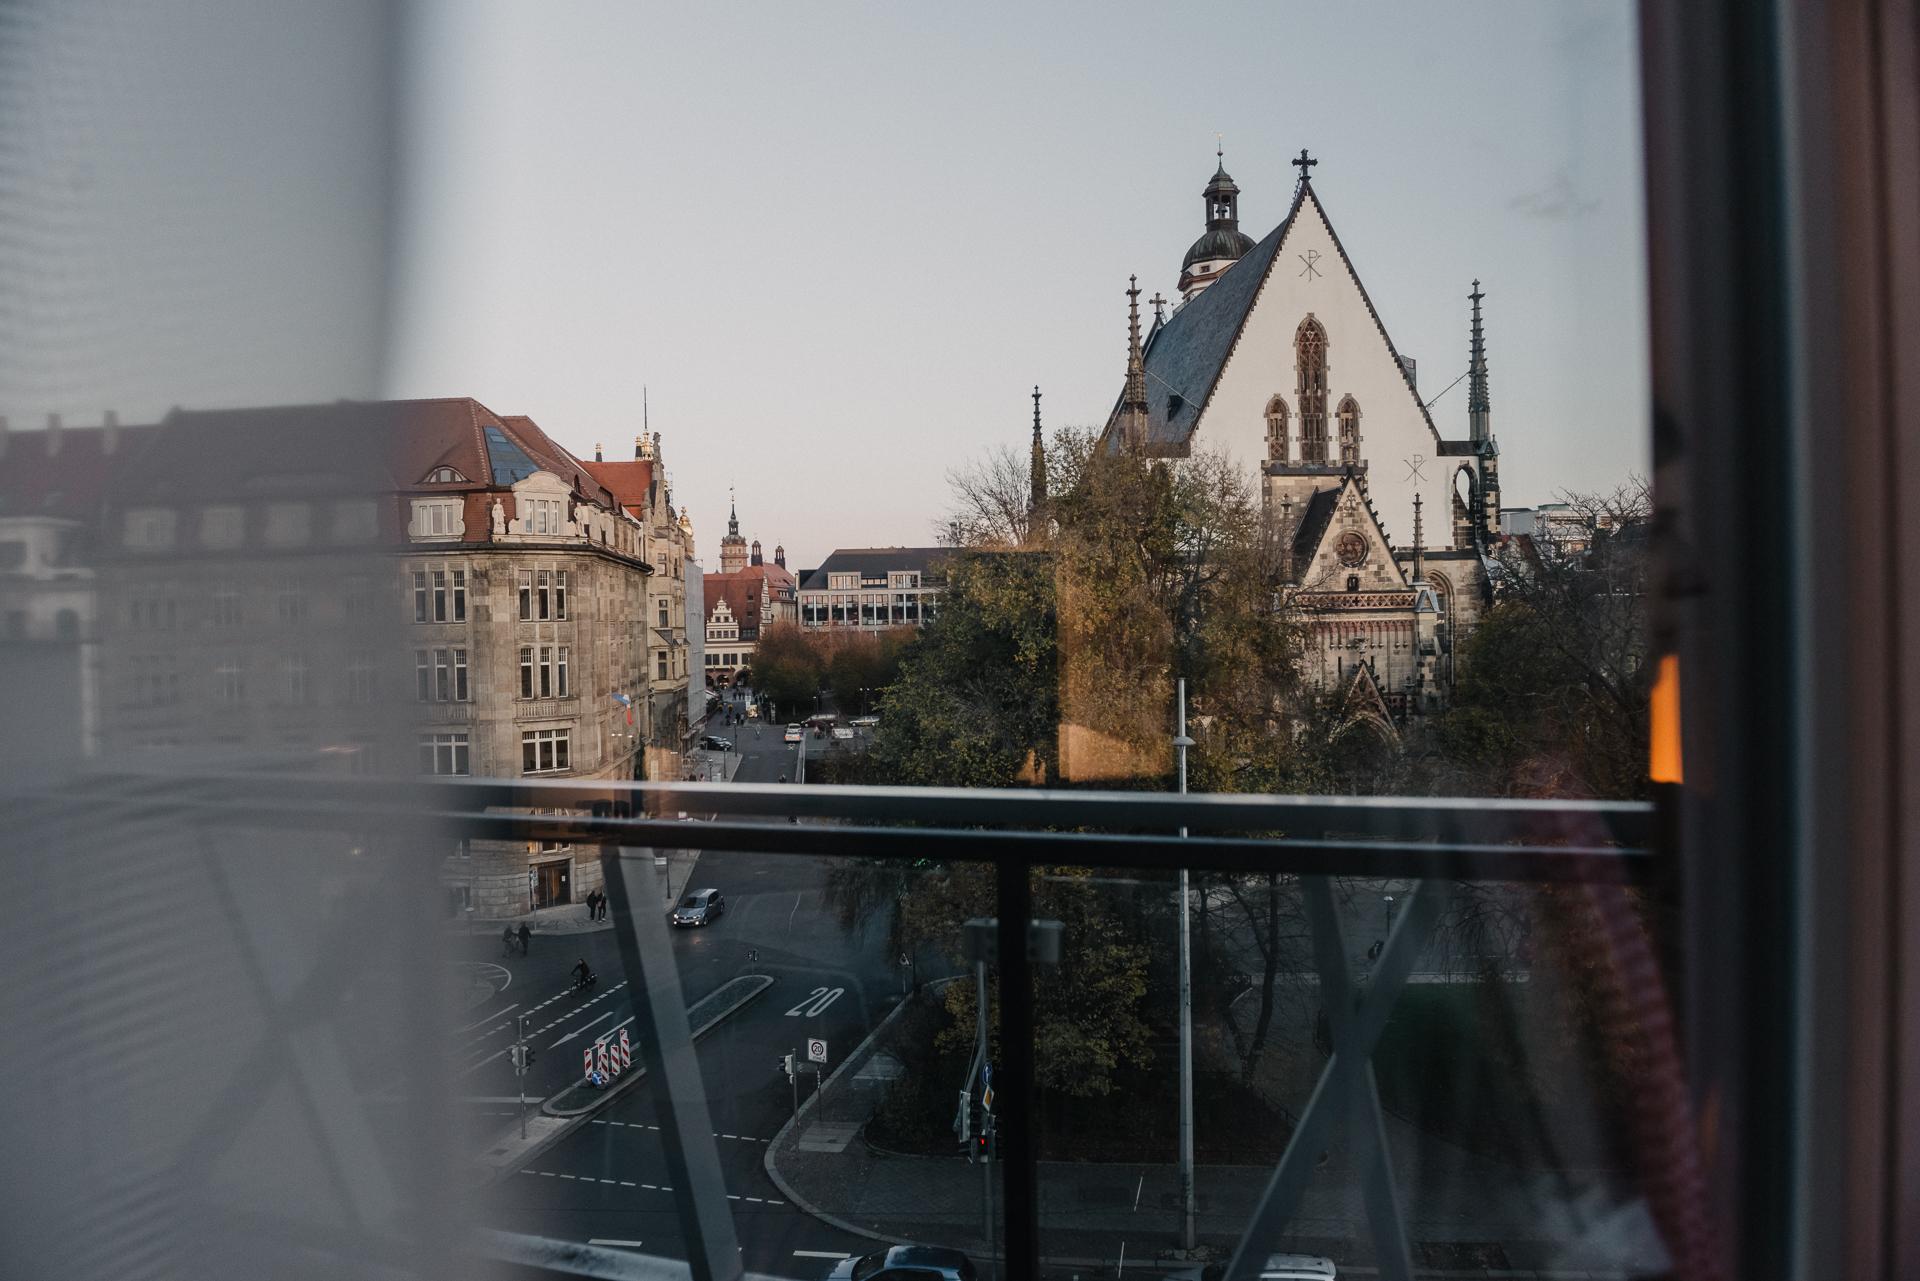 Zweinander-LeonoreHerzog-WeddingMarket-OnTour20191110-9489